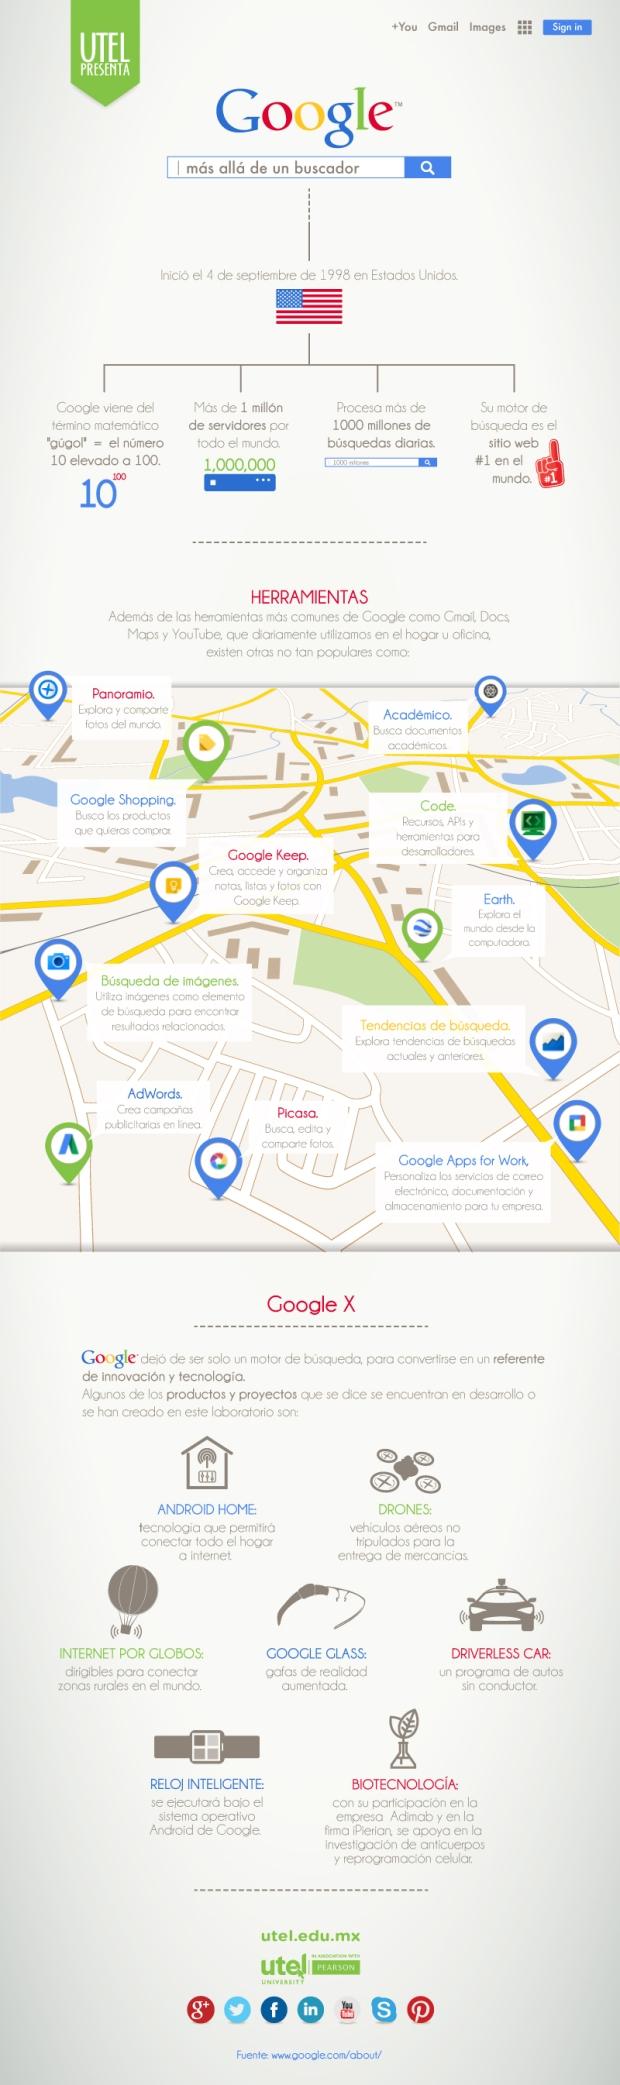 google-mas-alla-del-buscador-infografia